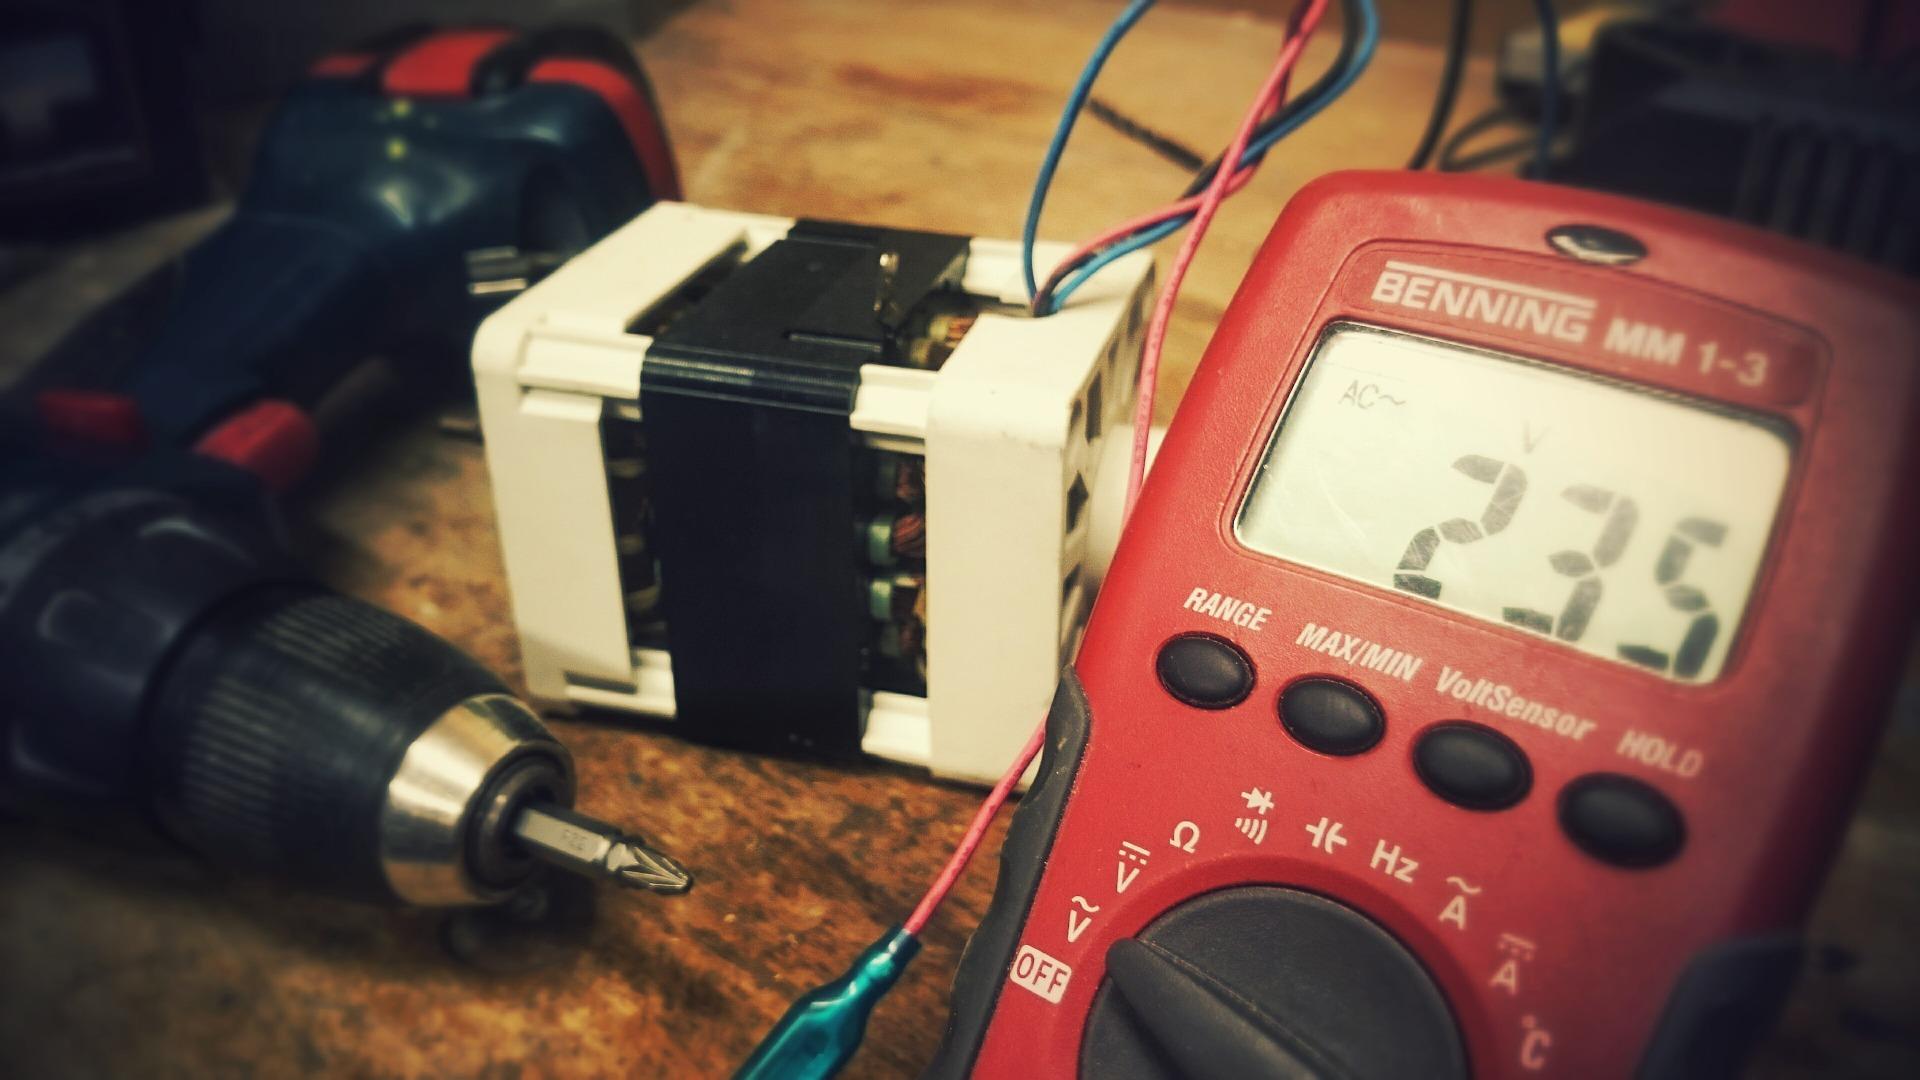 Electrical Supplies Distributor For Sale in Kelowna